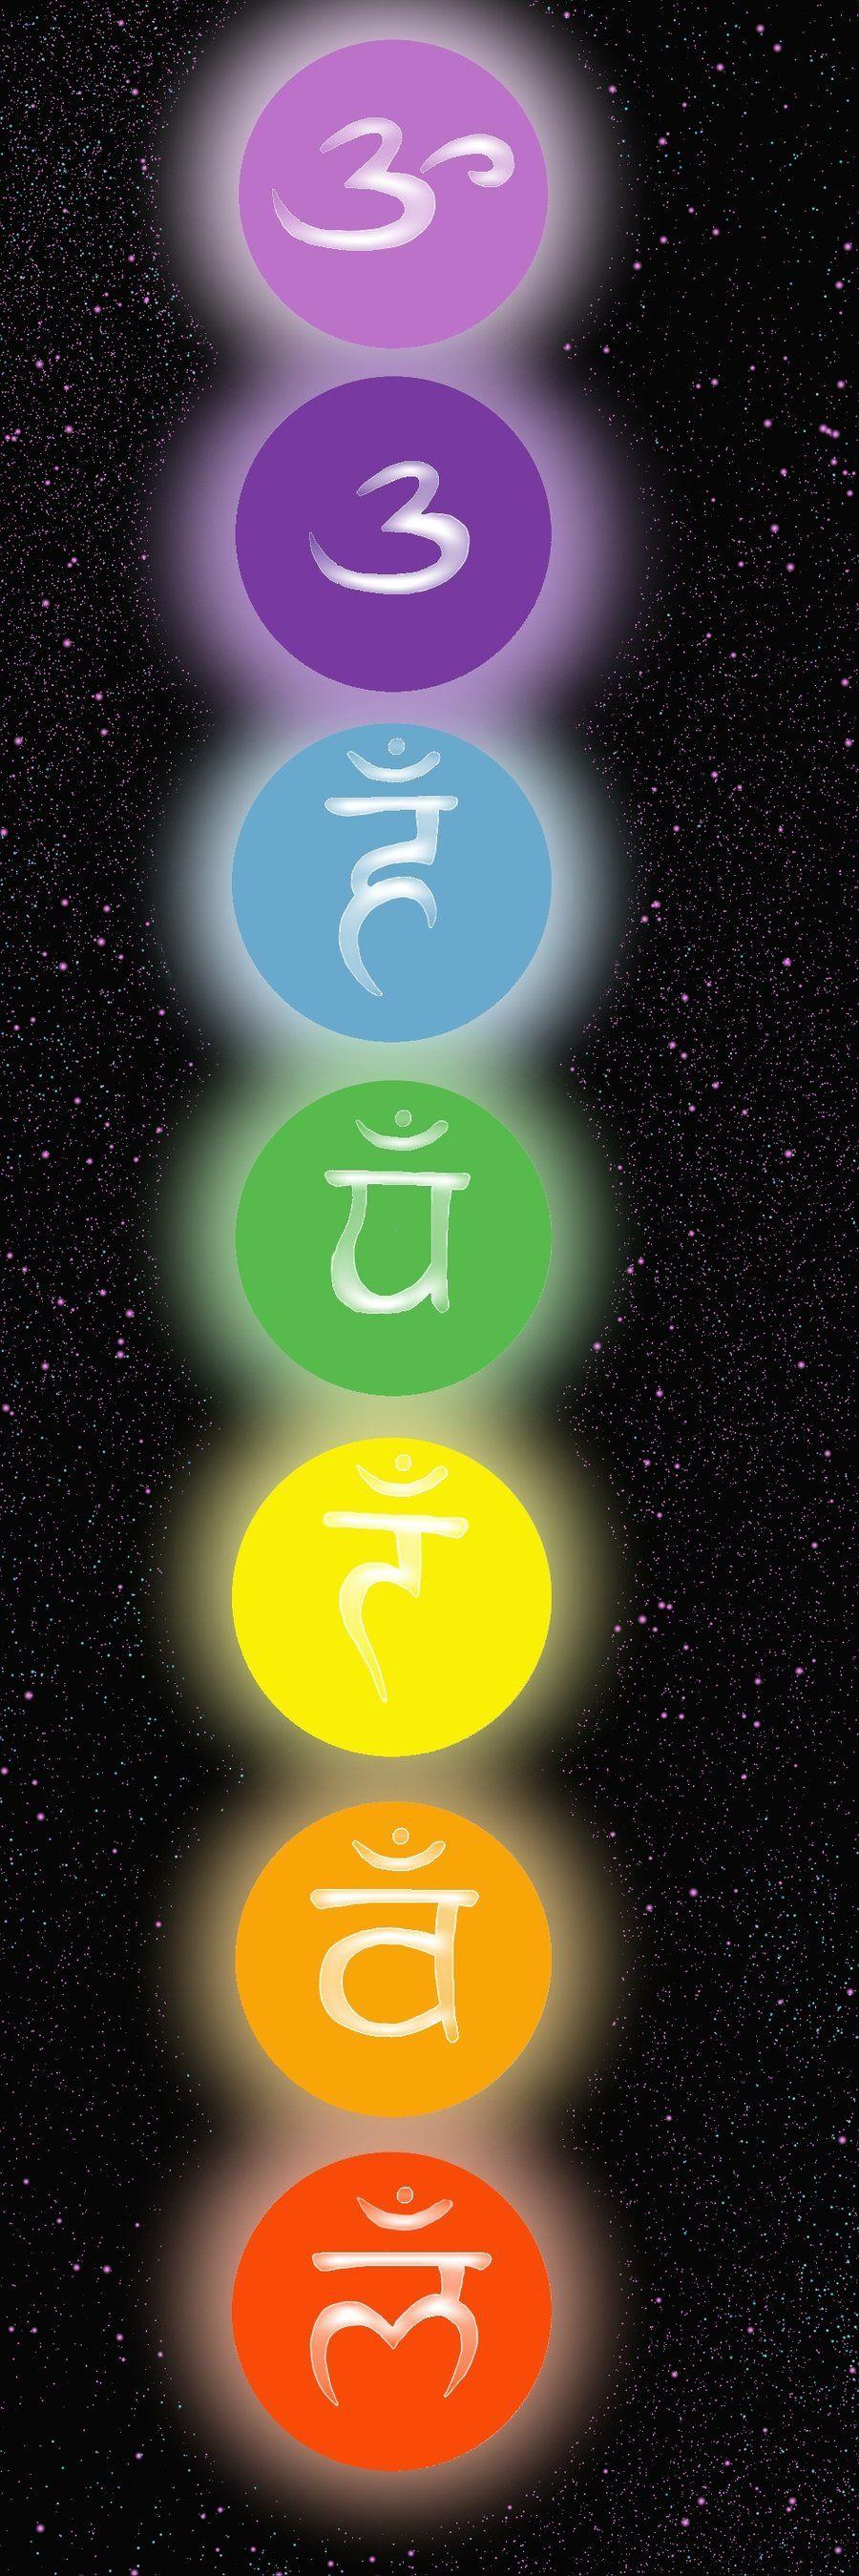 Los 7 Chakras The 7 Chakras Avatar The 7